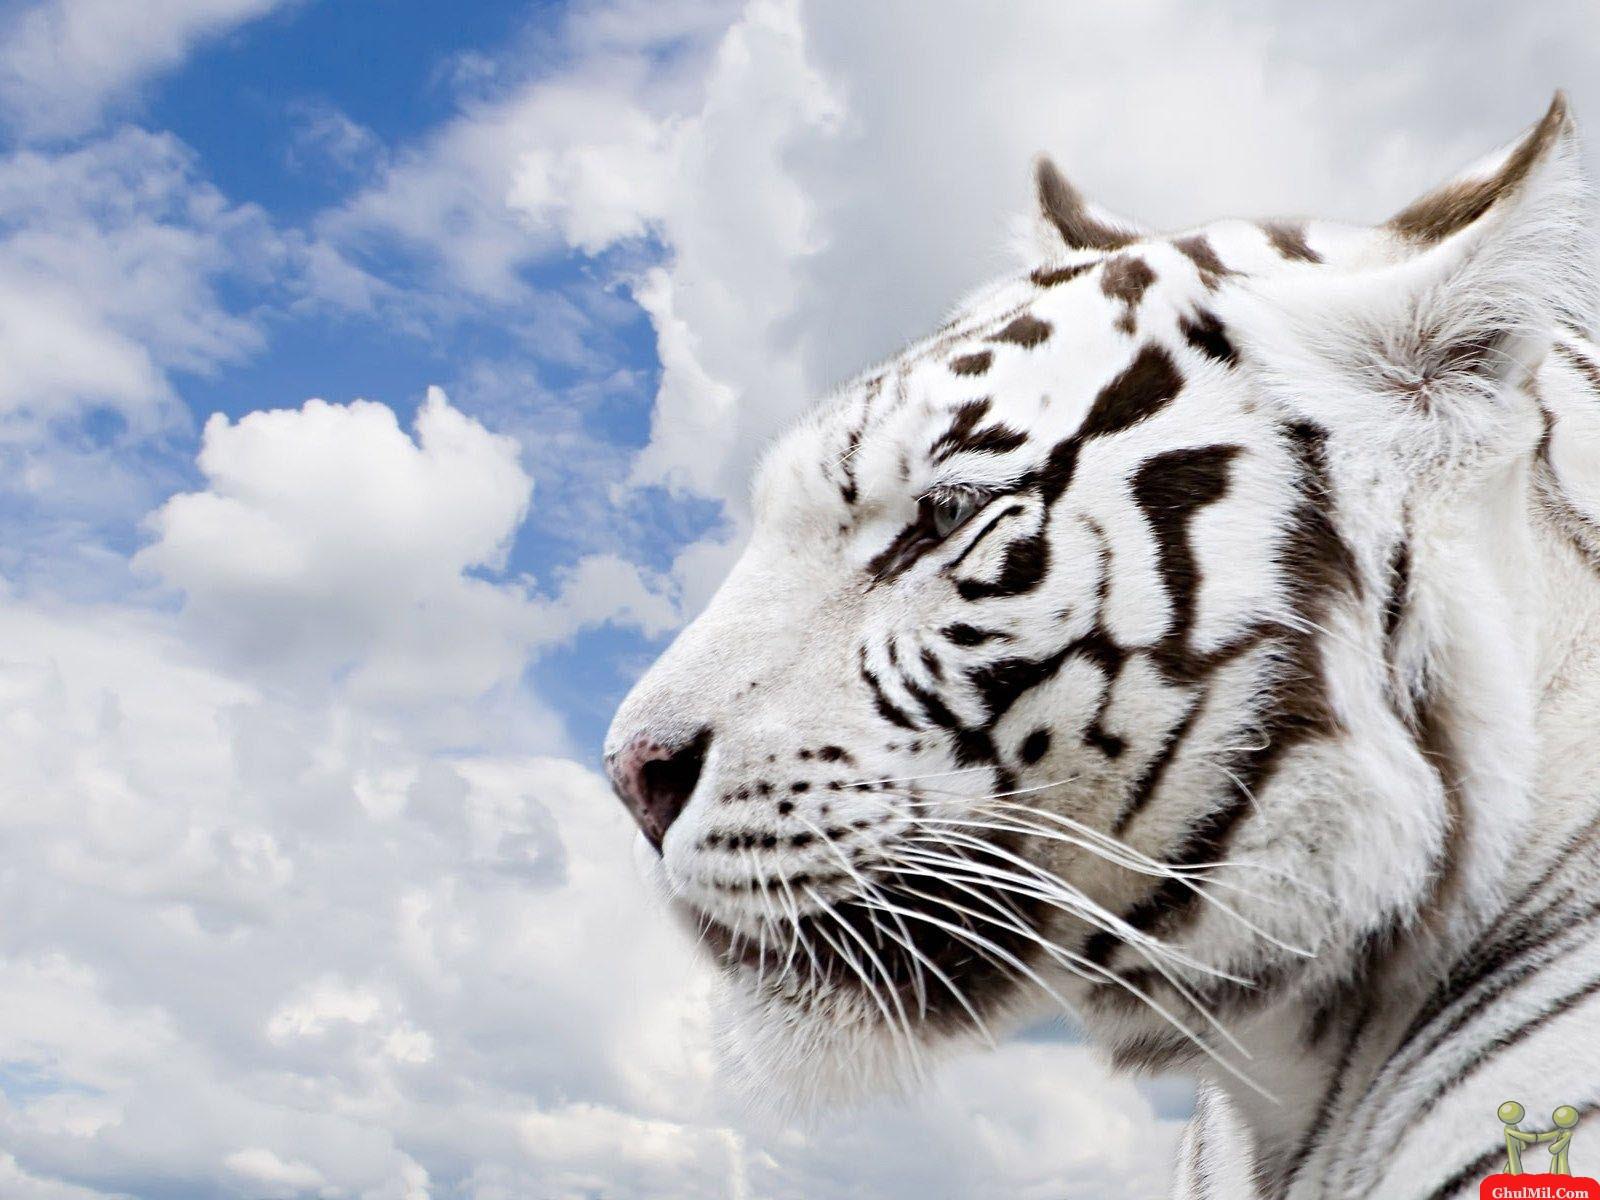 http://1.bp.blogspot.com/-JWaul-QiIo0/T1hh10yAOpI/AAAAAAAABgk/WMSNnmHt2HQ/s1600/siberian-tiger-wallpaper+1.jpg